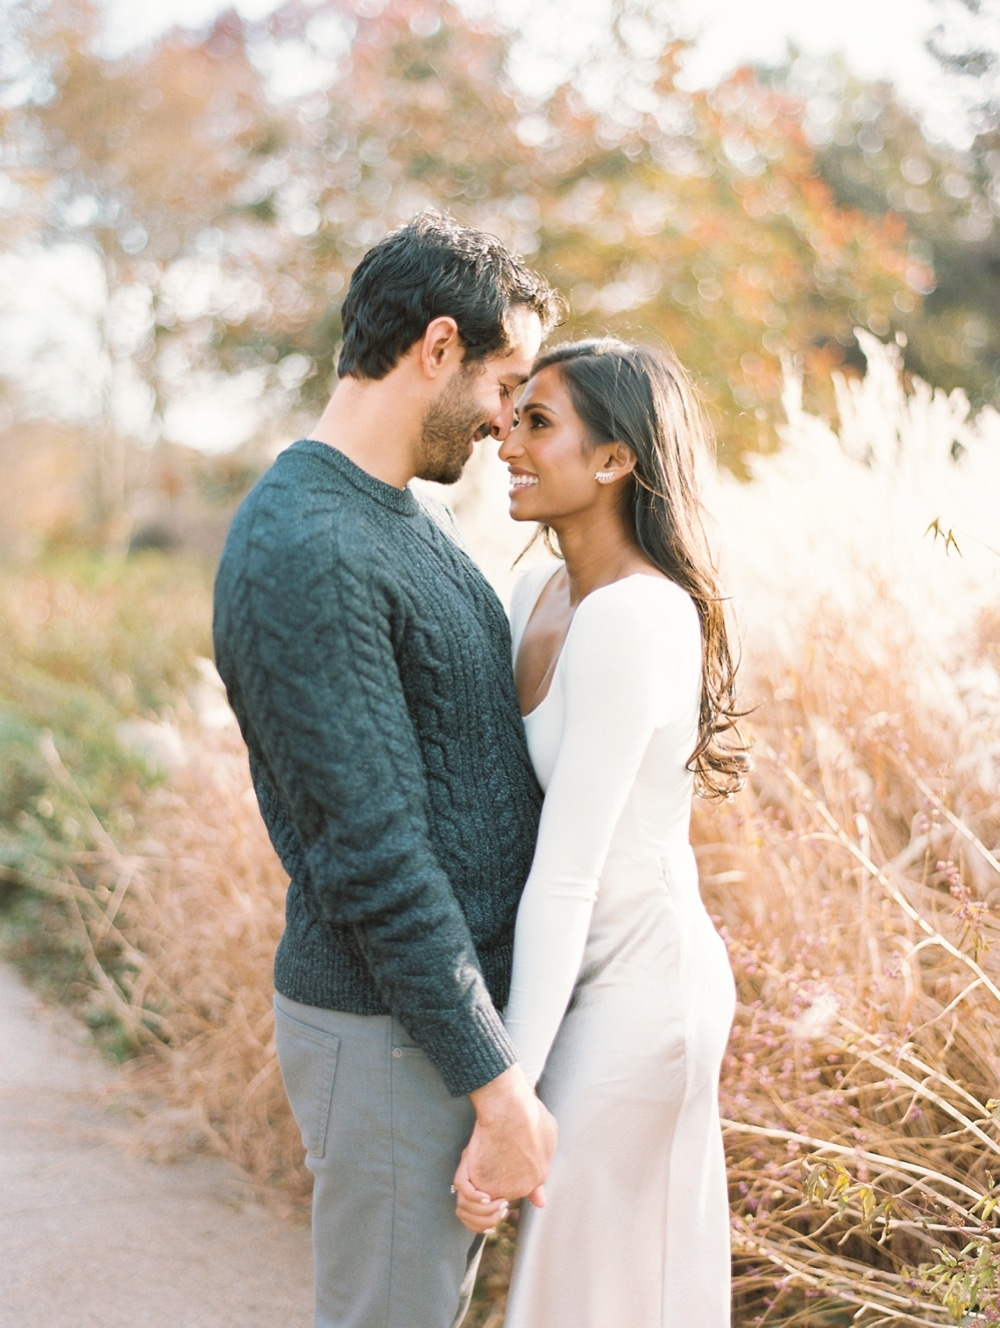 Kristin-La-Voie-Photography-morton-arboretum-chicago-wedding-photographer-18